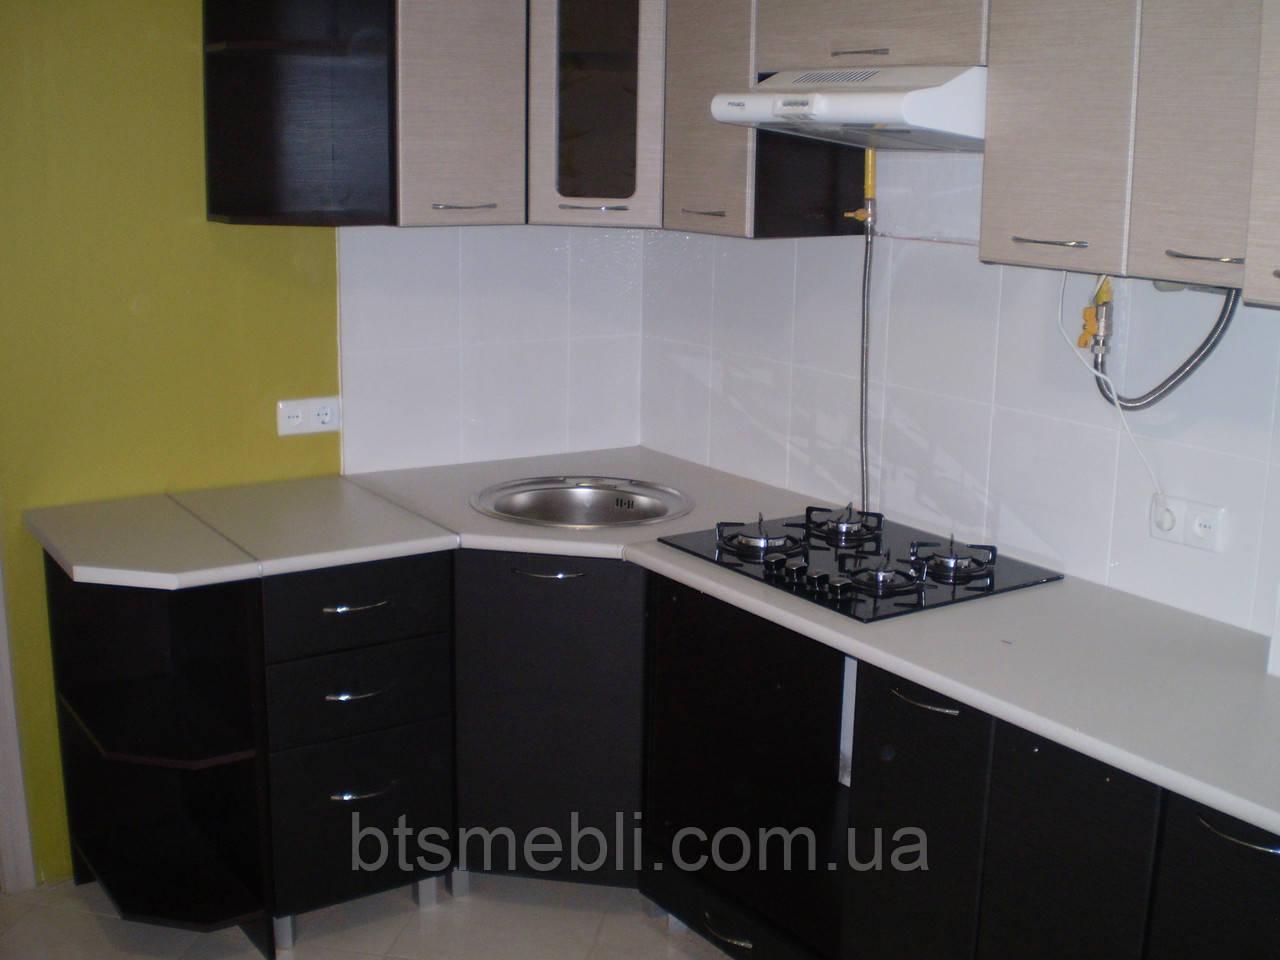 Кухня Импульс МДФ 2.0 м